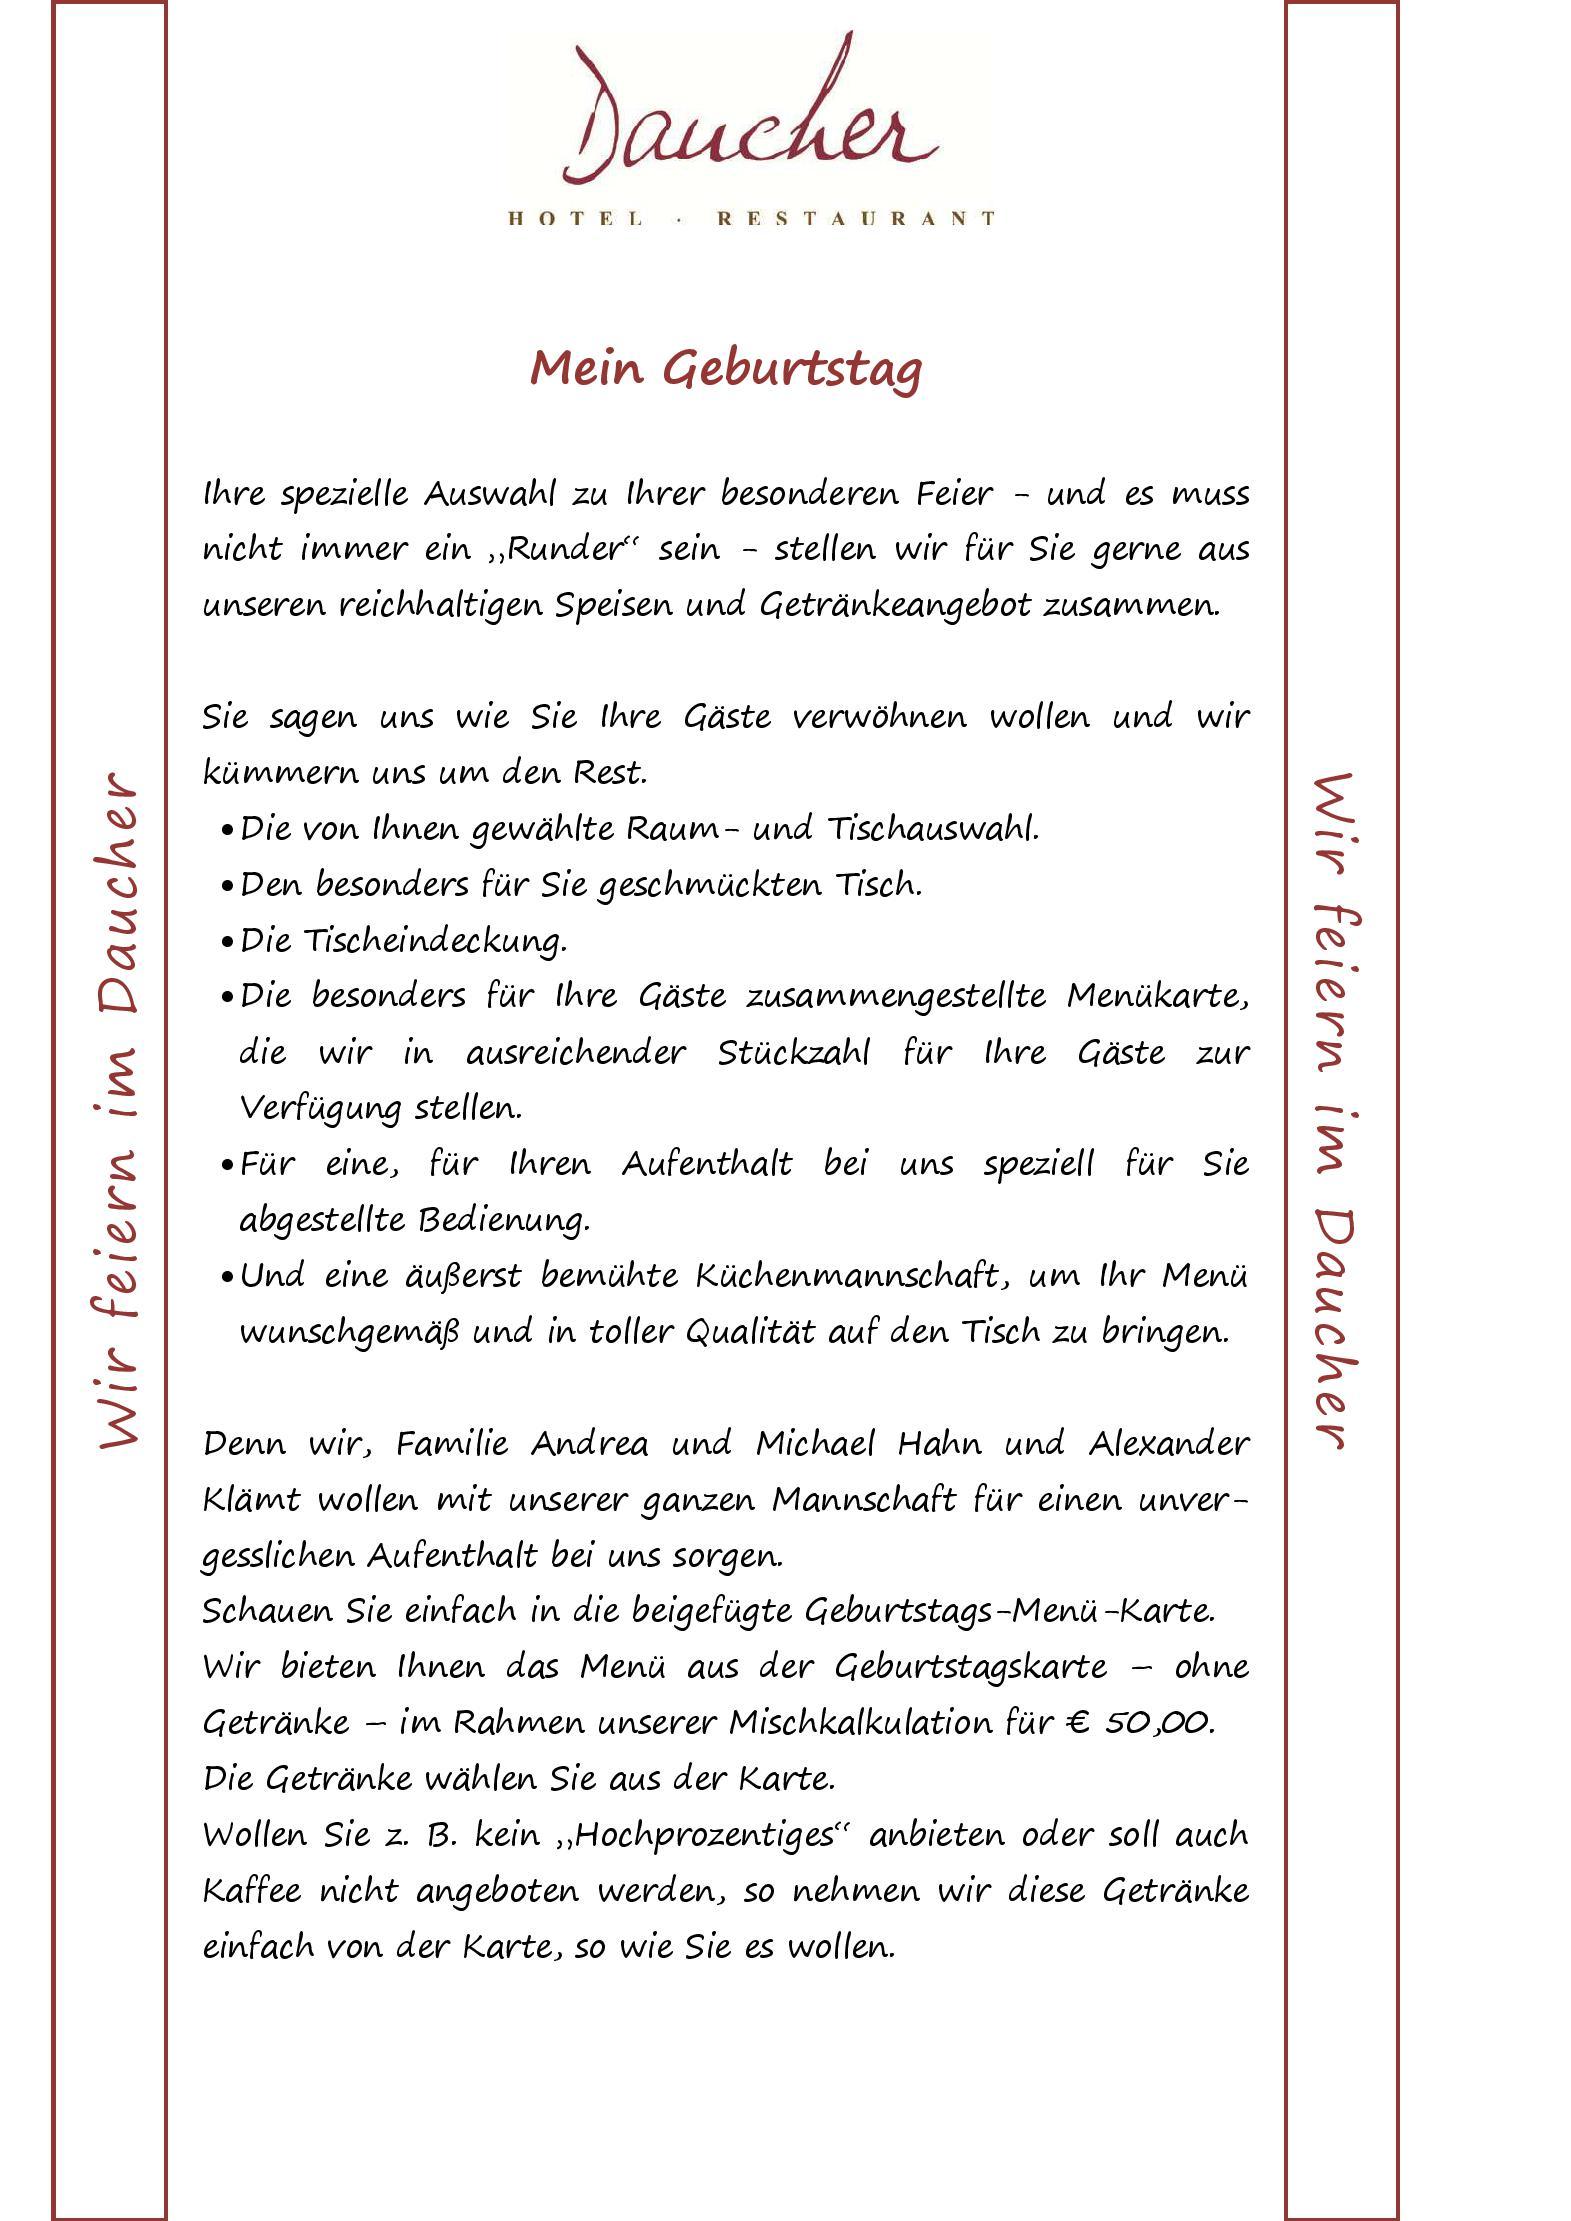 Speisekarte - Restaurant Daucher in Nürnberg - DeutschlandGourmet